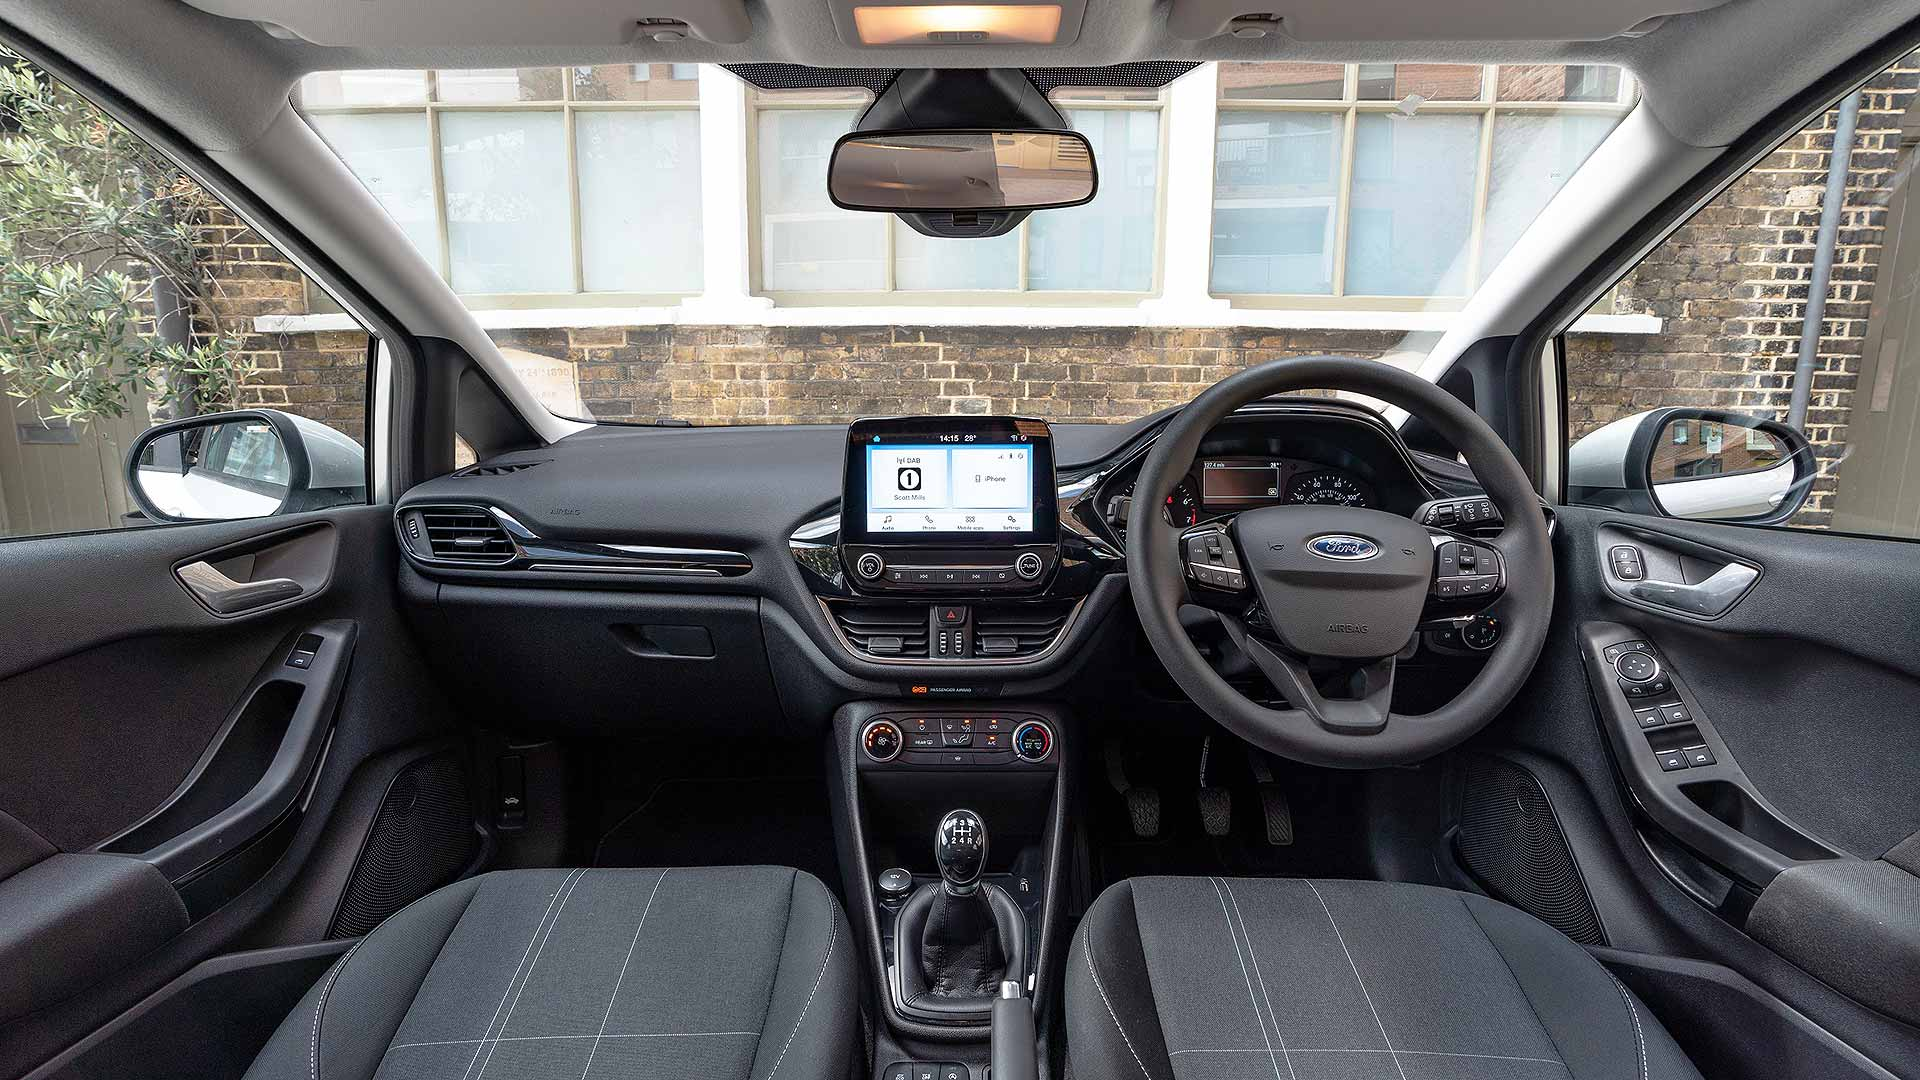 Ford Fiesta Trend interior